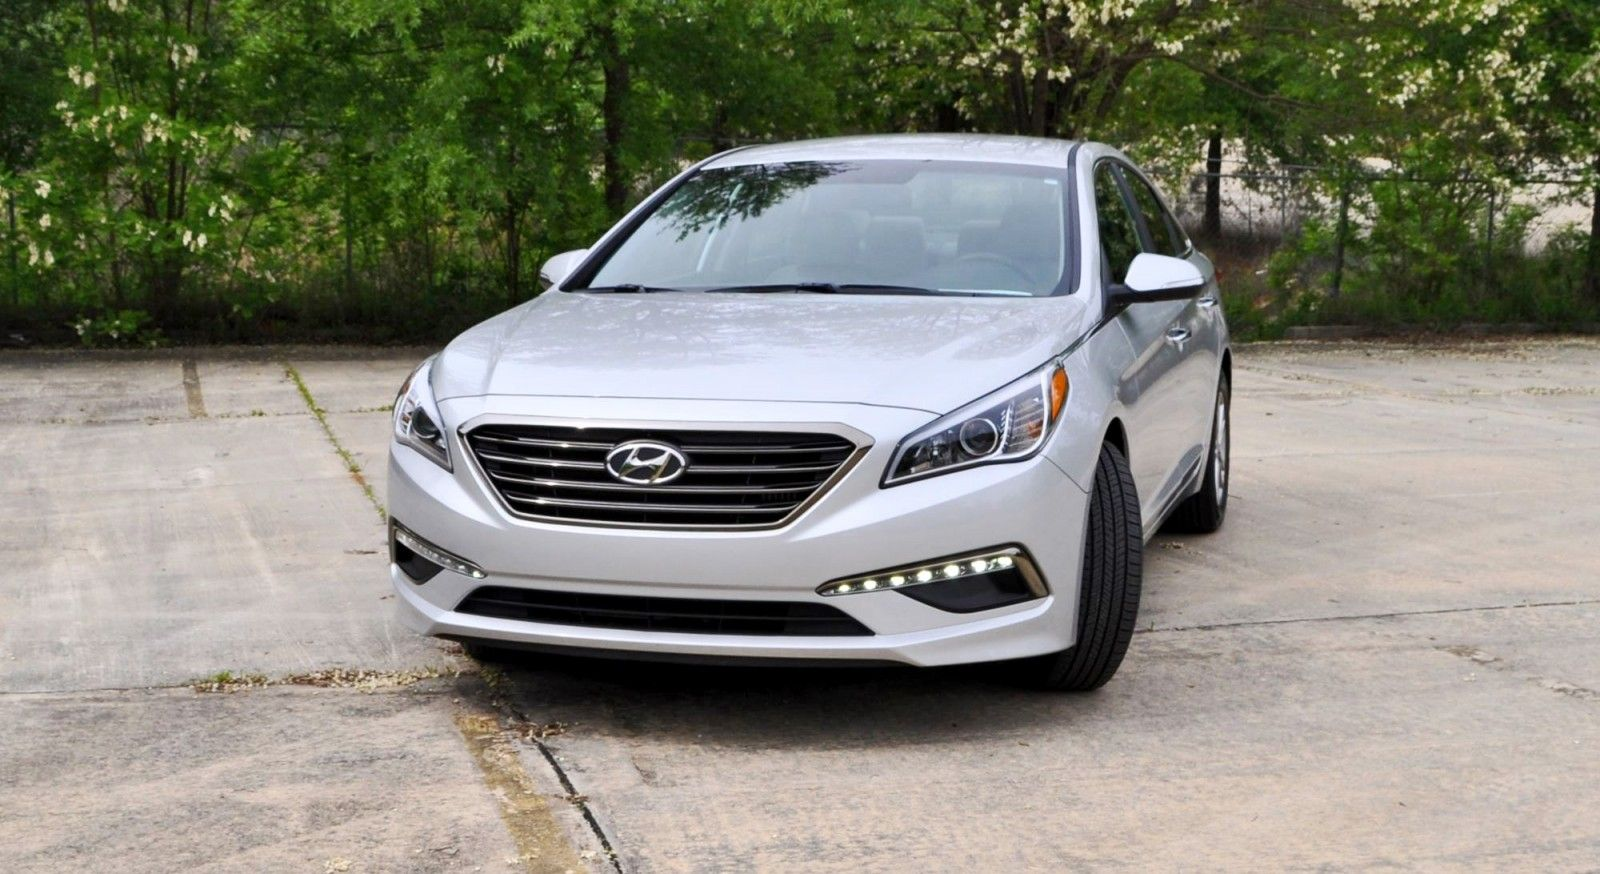 34+ Hyundai sonata 16 t inspirations